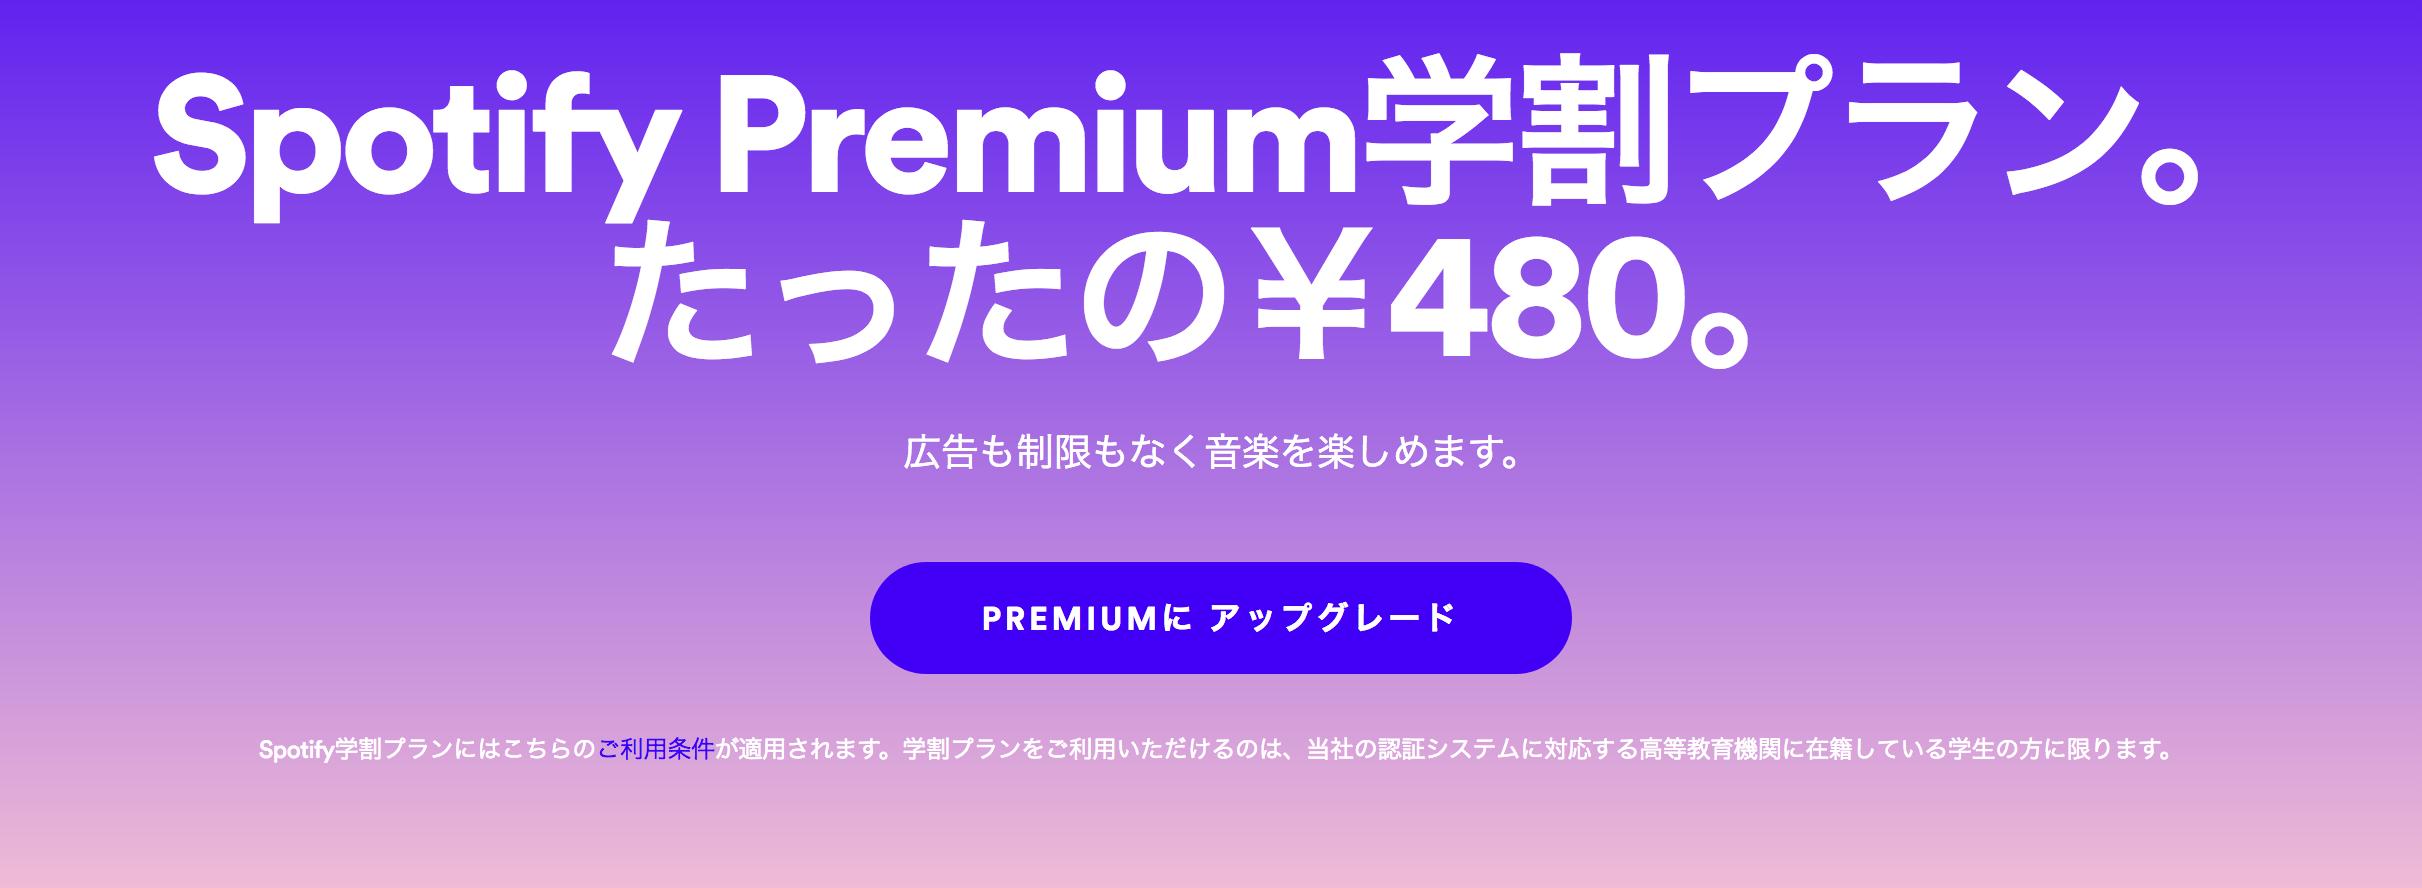 Spotifyに月額480円で利用できる「Premium学割プラン」が追加!大学生、短大生、高専生のみ!